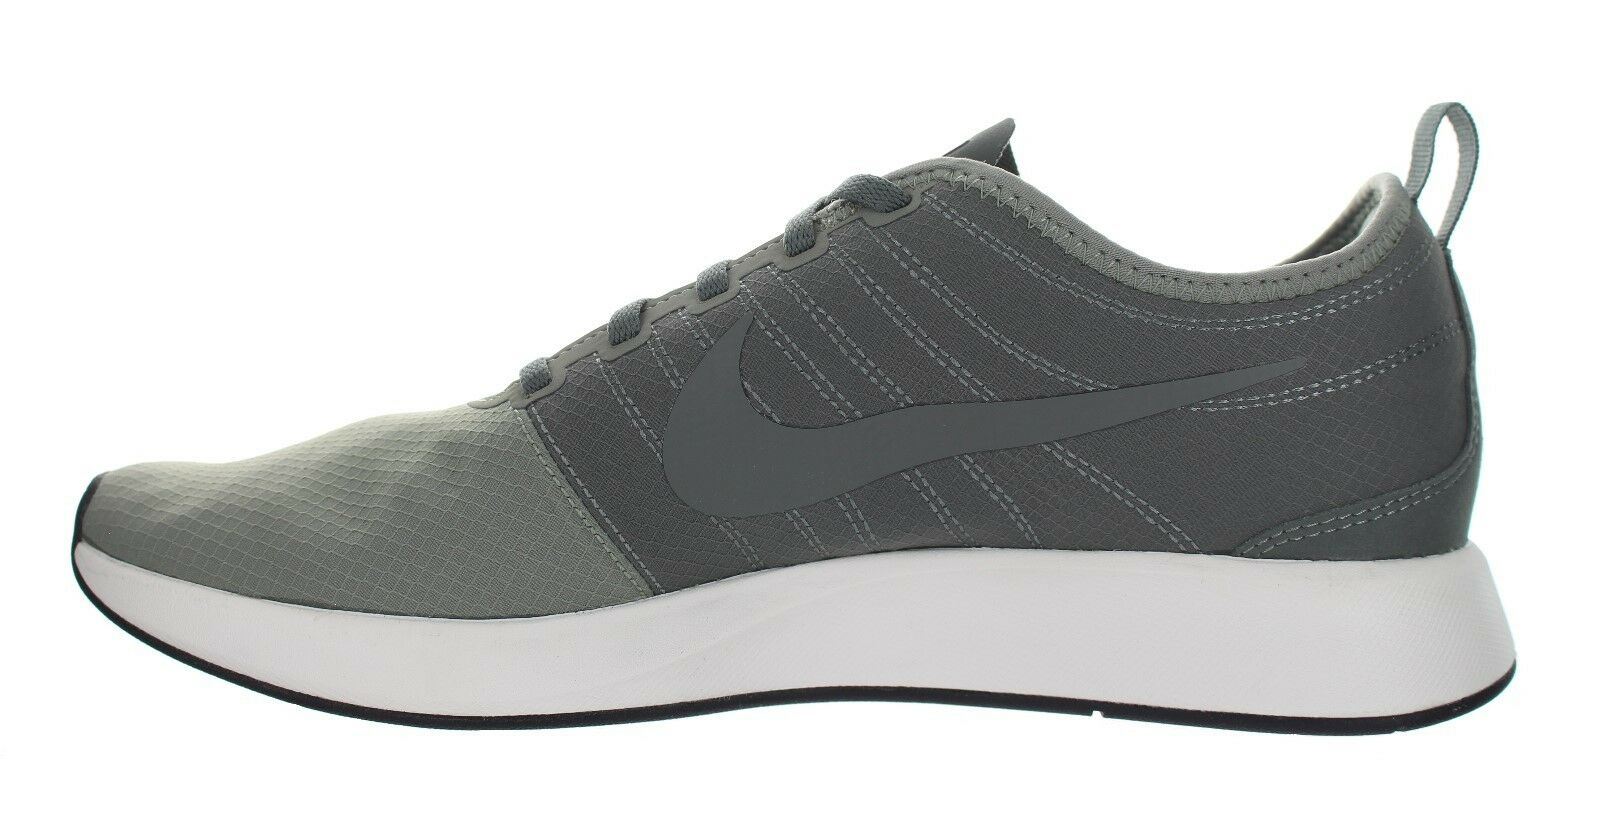 Nike uomini  dualtone racer se  dark stucco scarpe da corsa molteplici dimensioni pennino | Moderno Ed Elegante A Moda  | Sig/Sig Ra Scarpa